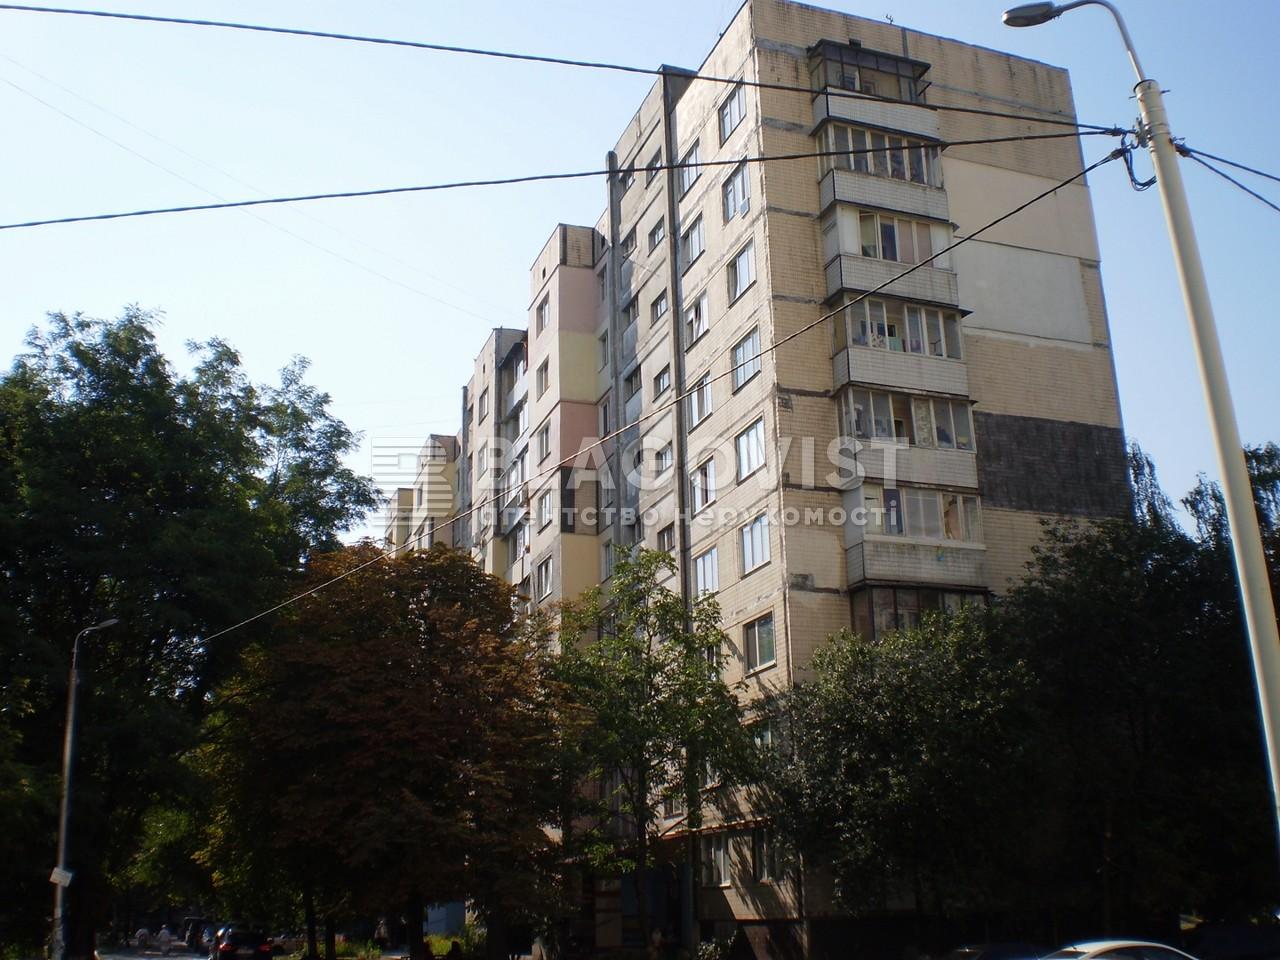 Квартира F-43408, Якубовского Маршала, 2, Киев - Фото 2